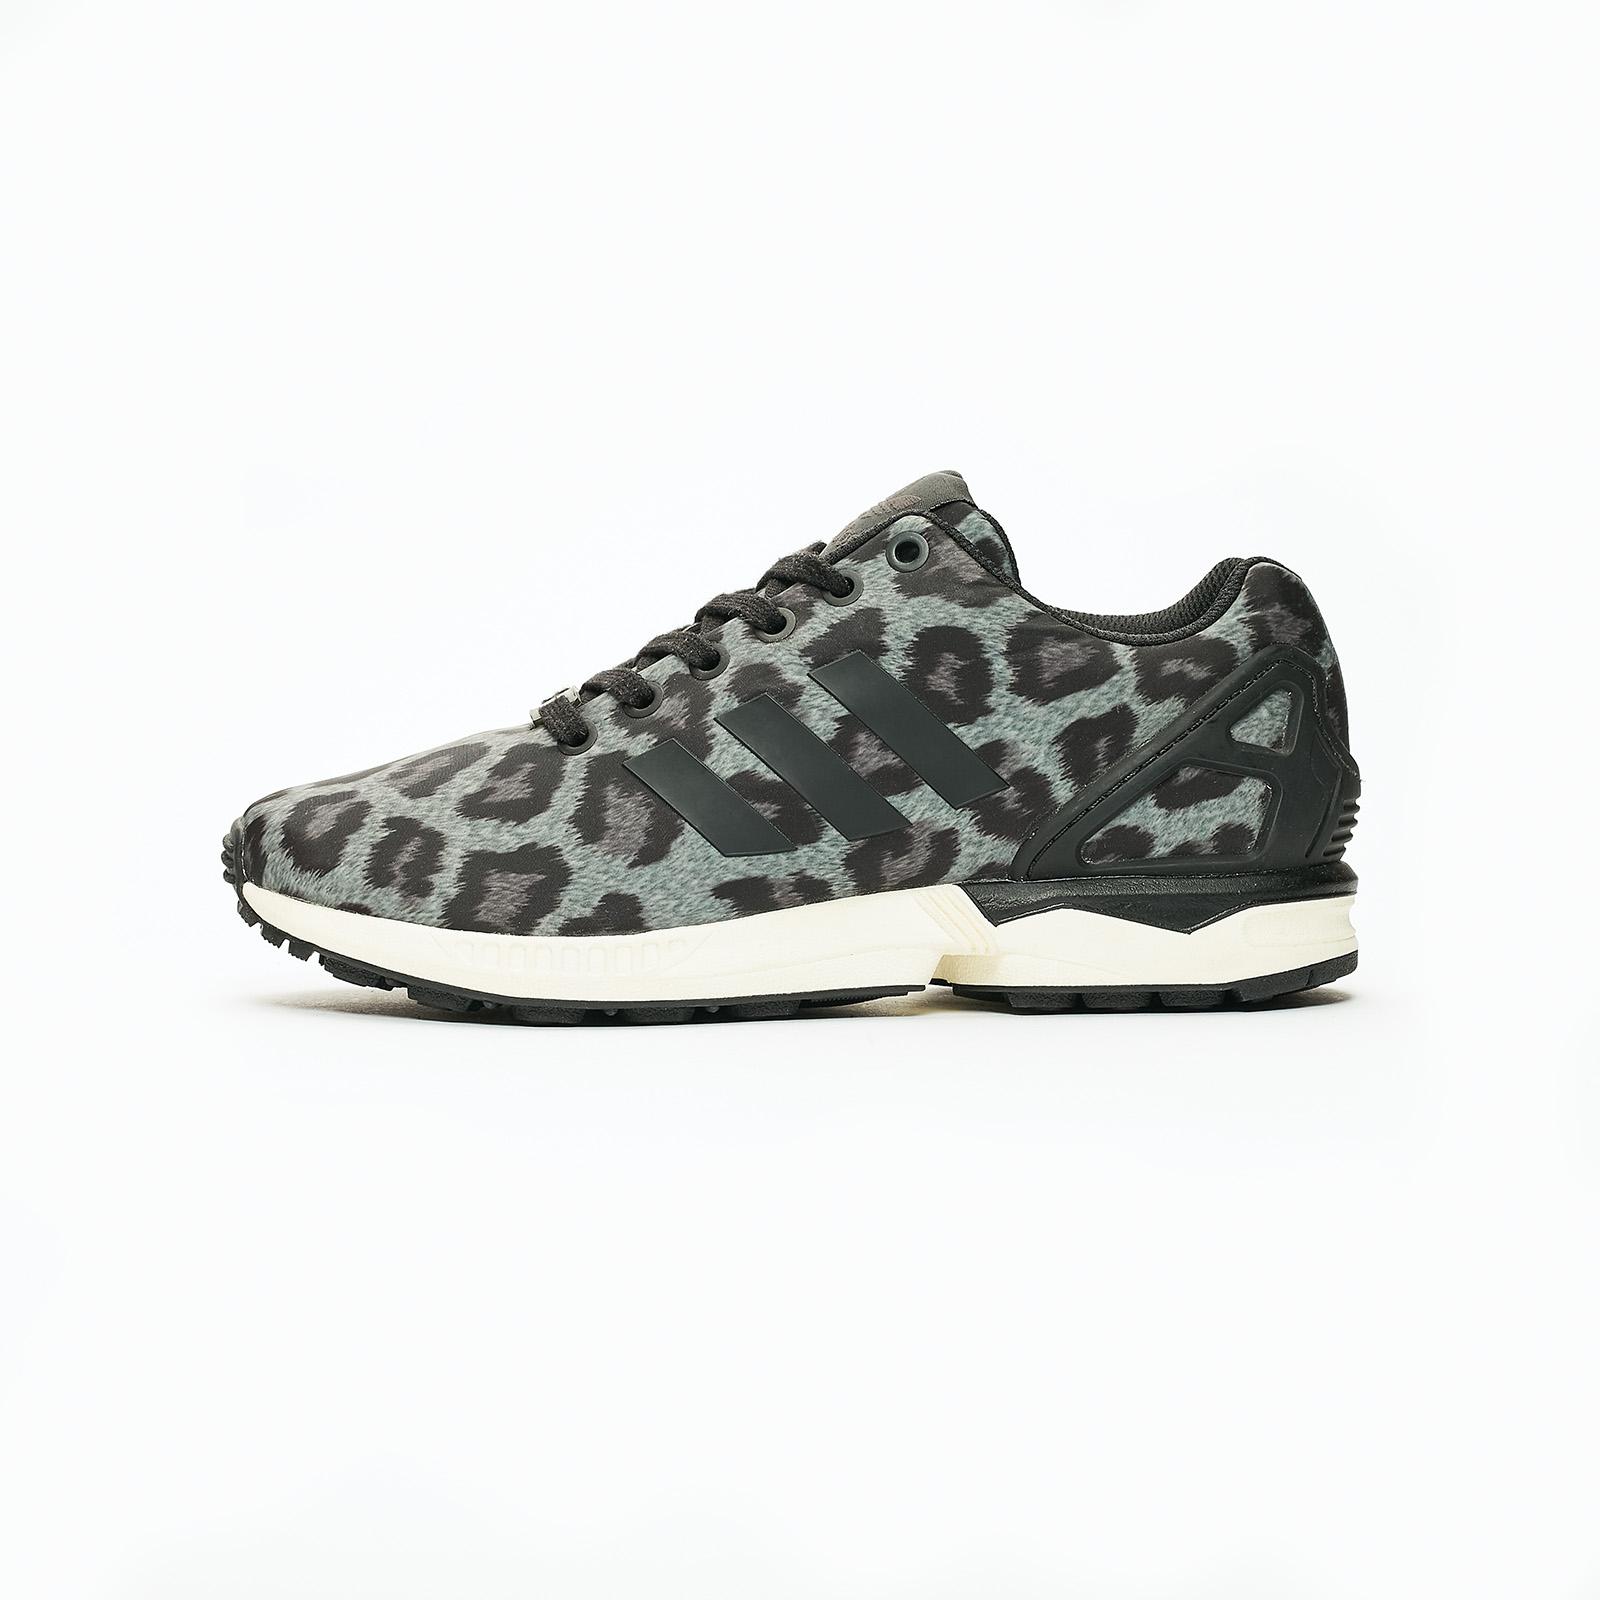 Adidas Originals ZX Flux Snow Leopard Men BlackCarbon